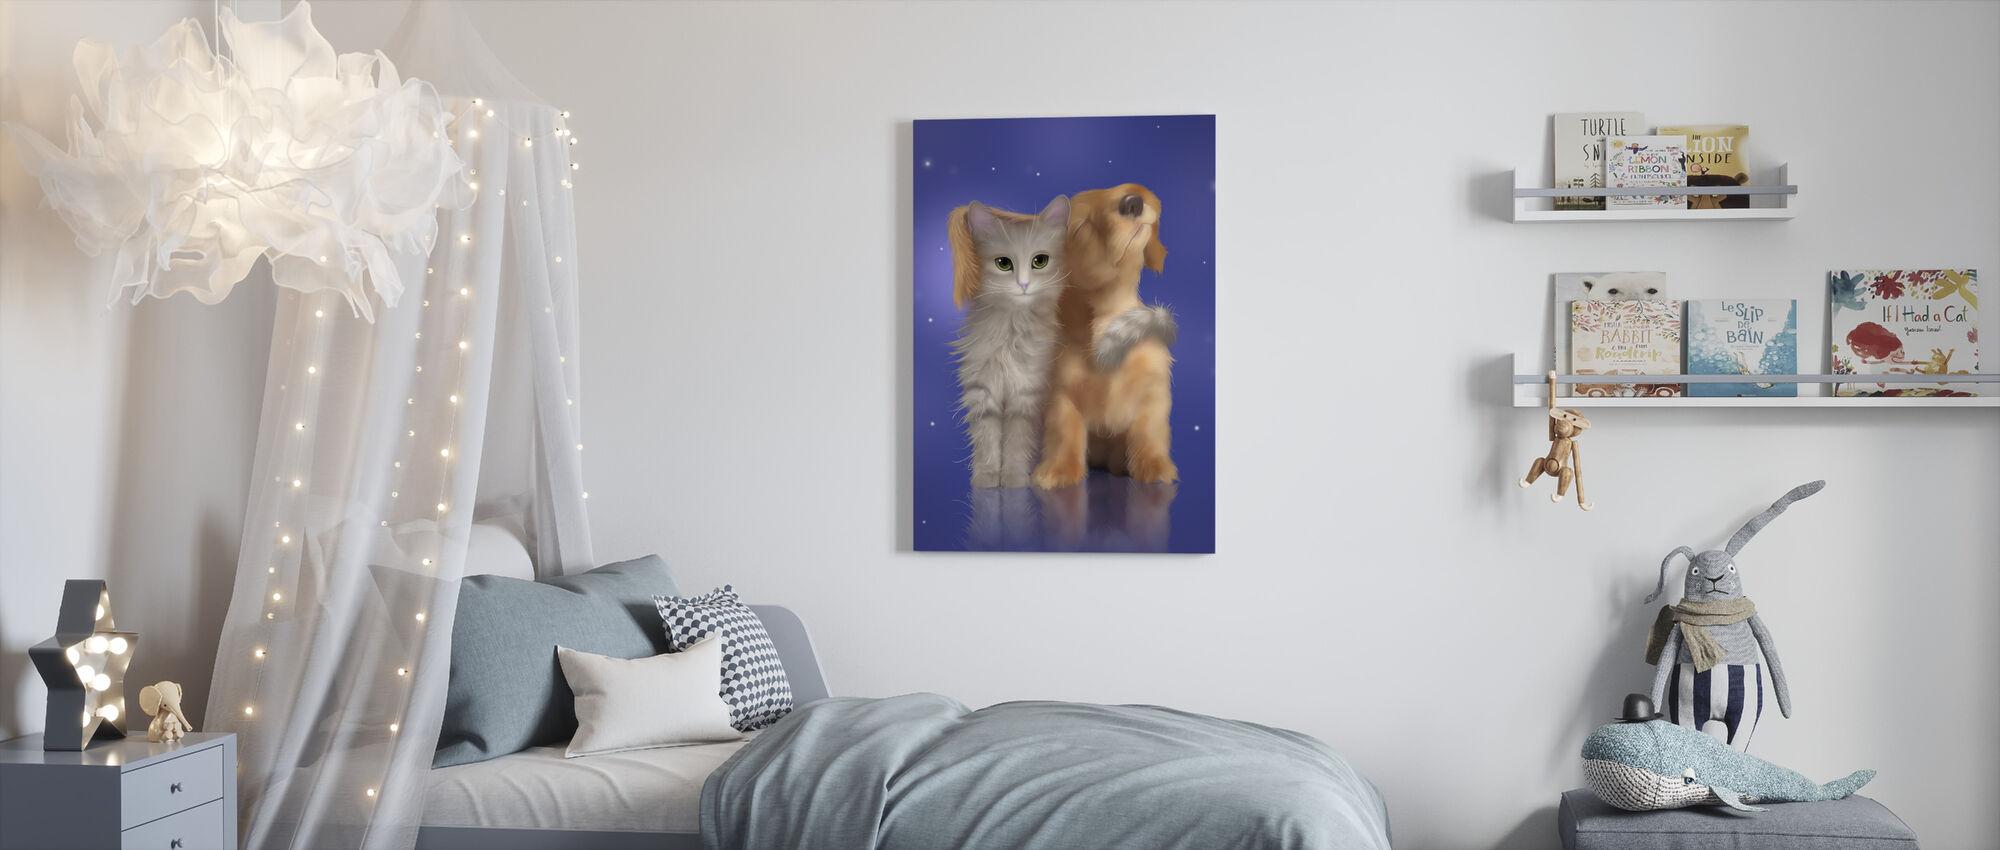 Puppy Liefde - Canvas print - Kinderkamer